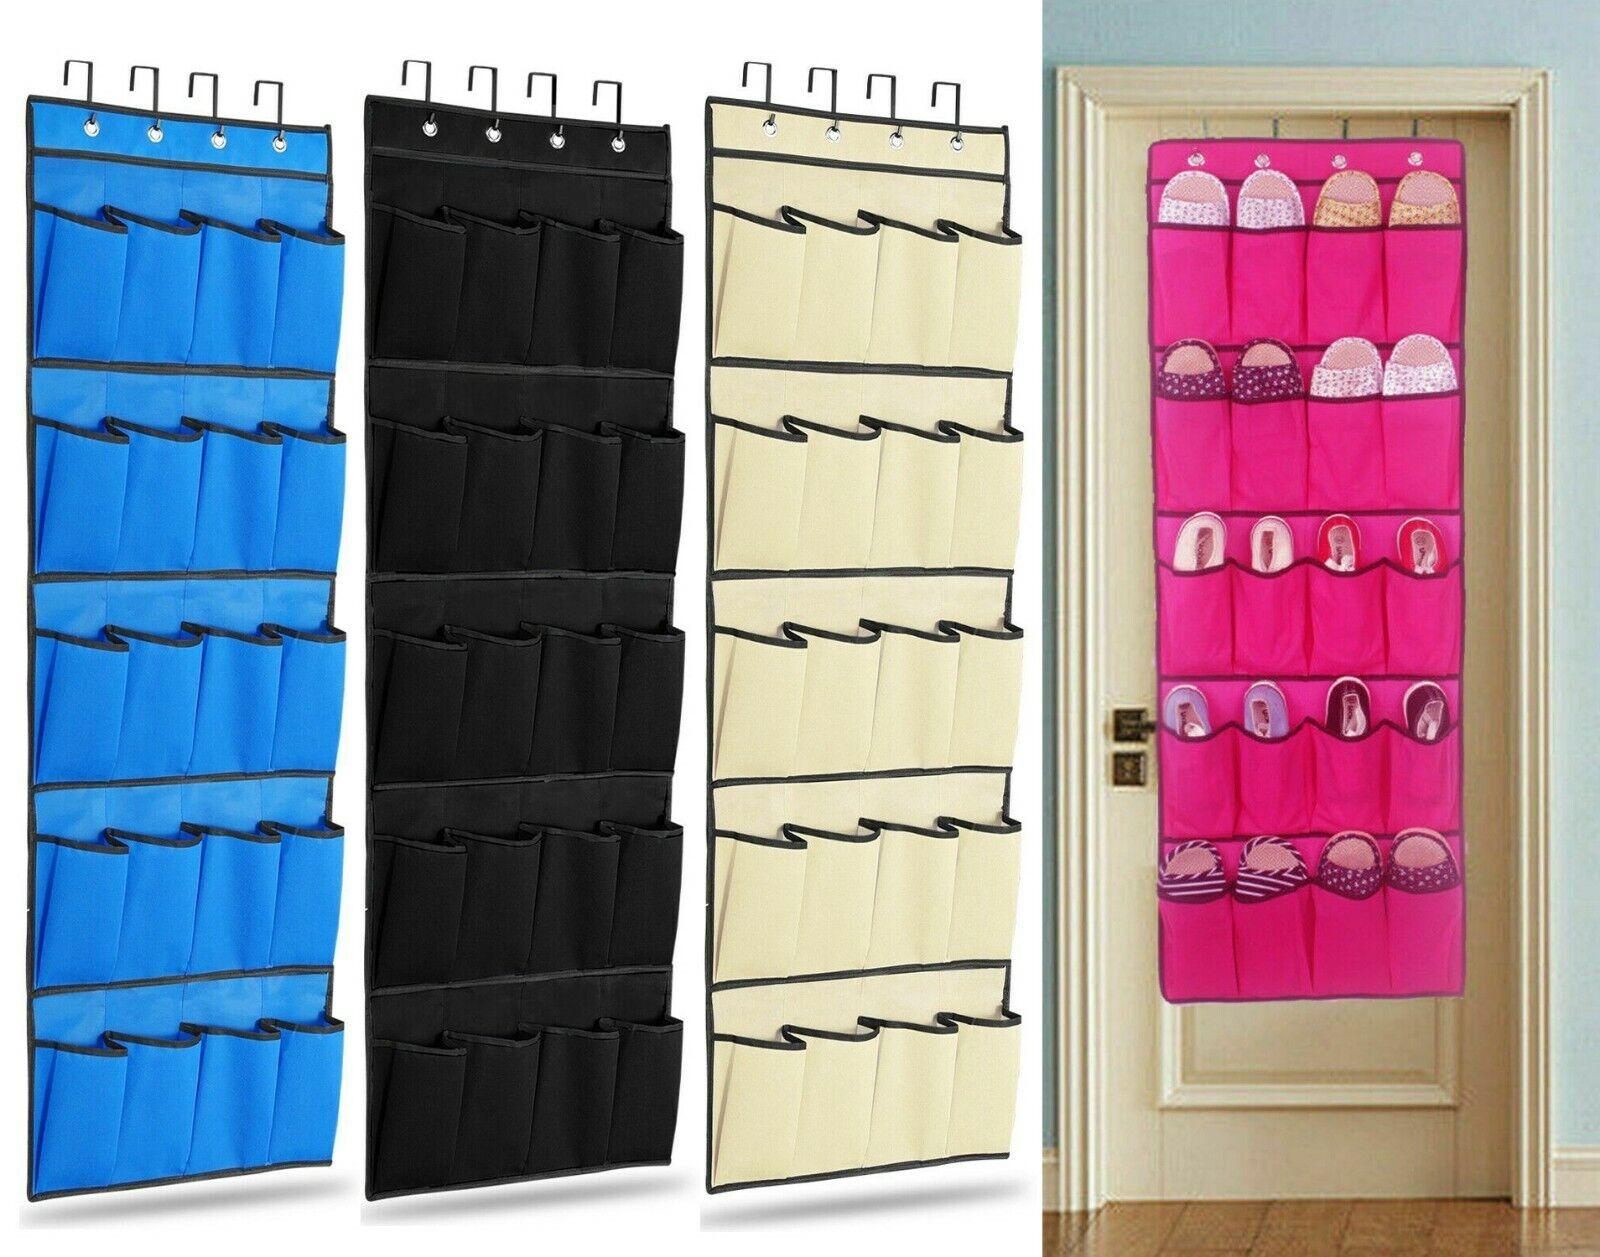 20 Pocket  Shoe Rack Hanging Over Door Tidy Organiser Space Storage Saver 4color